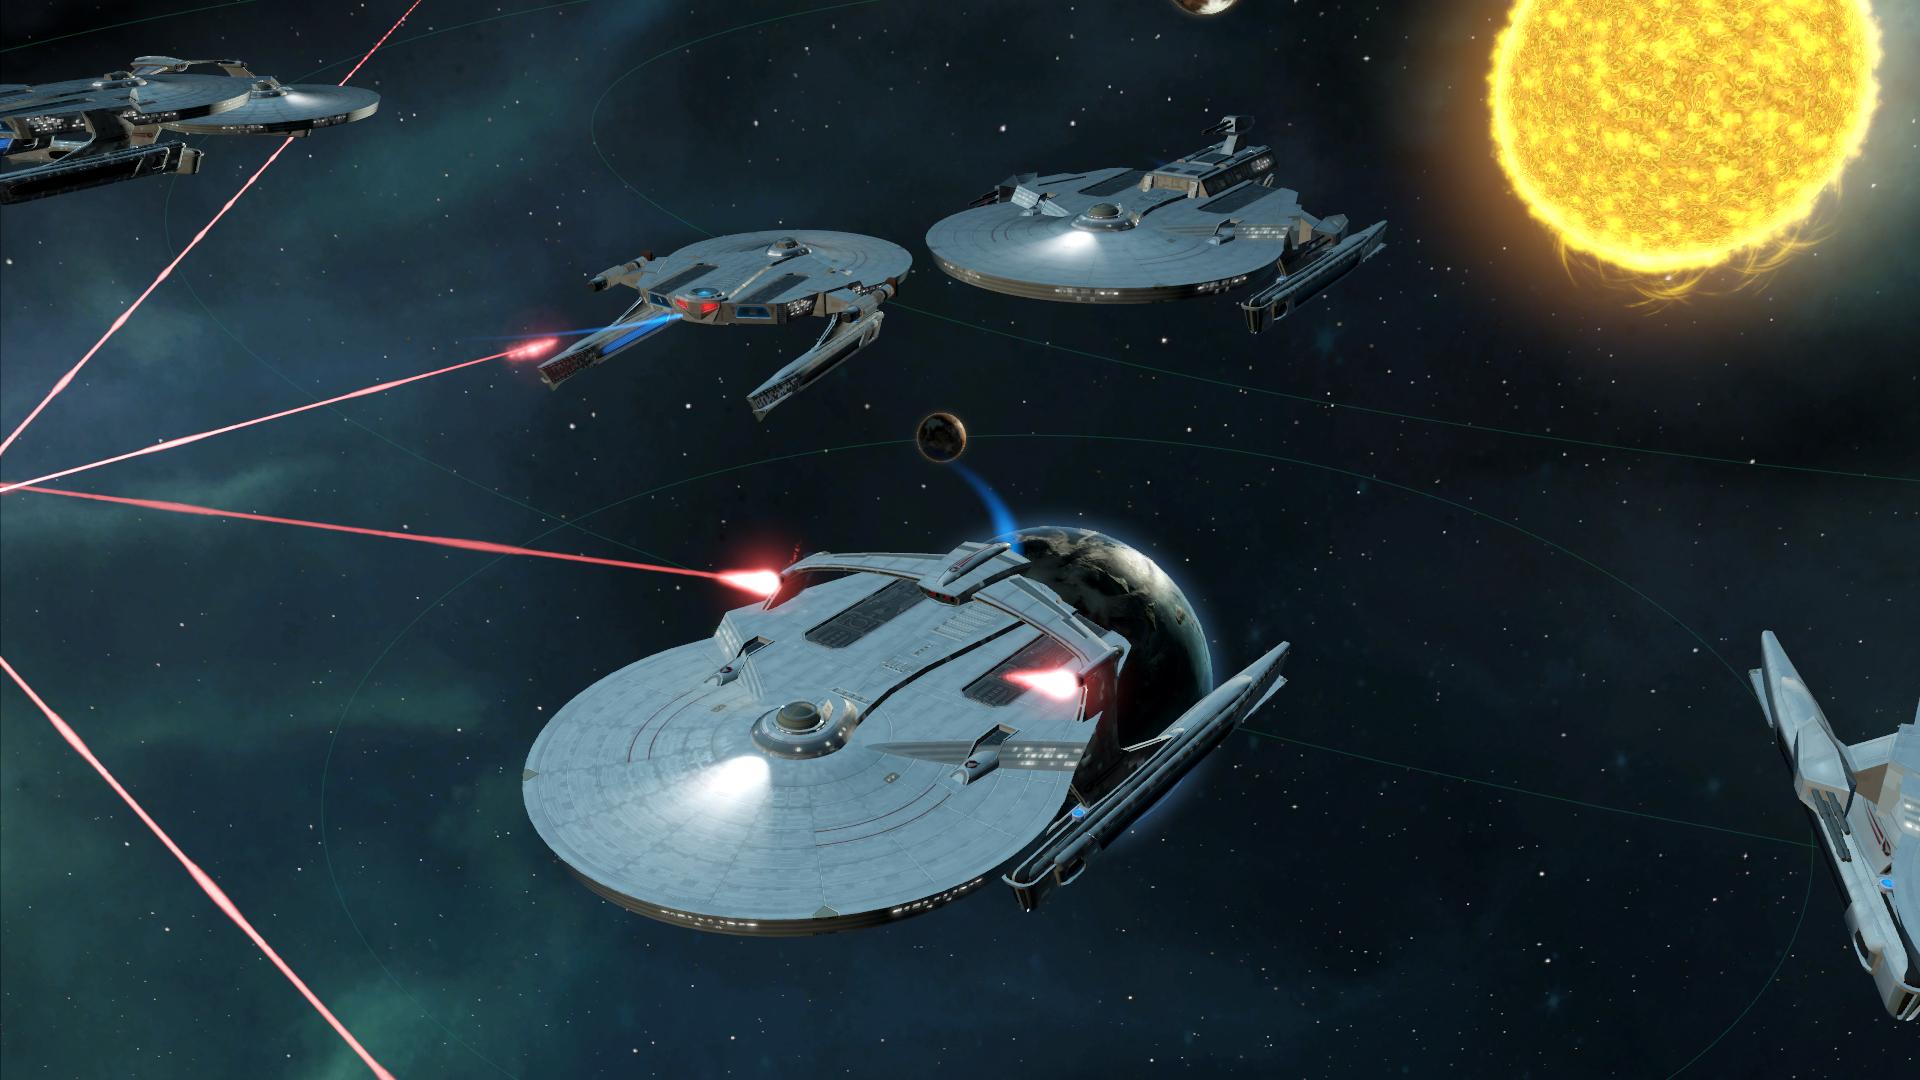 More Stellaris     image - Star Trek: Armada 3 mod for Sins of a